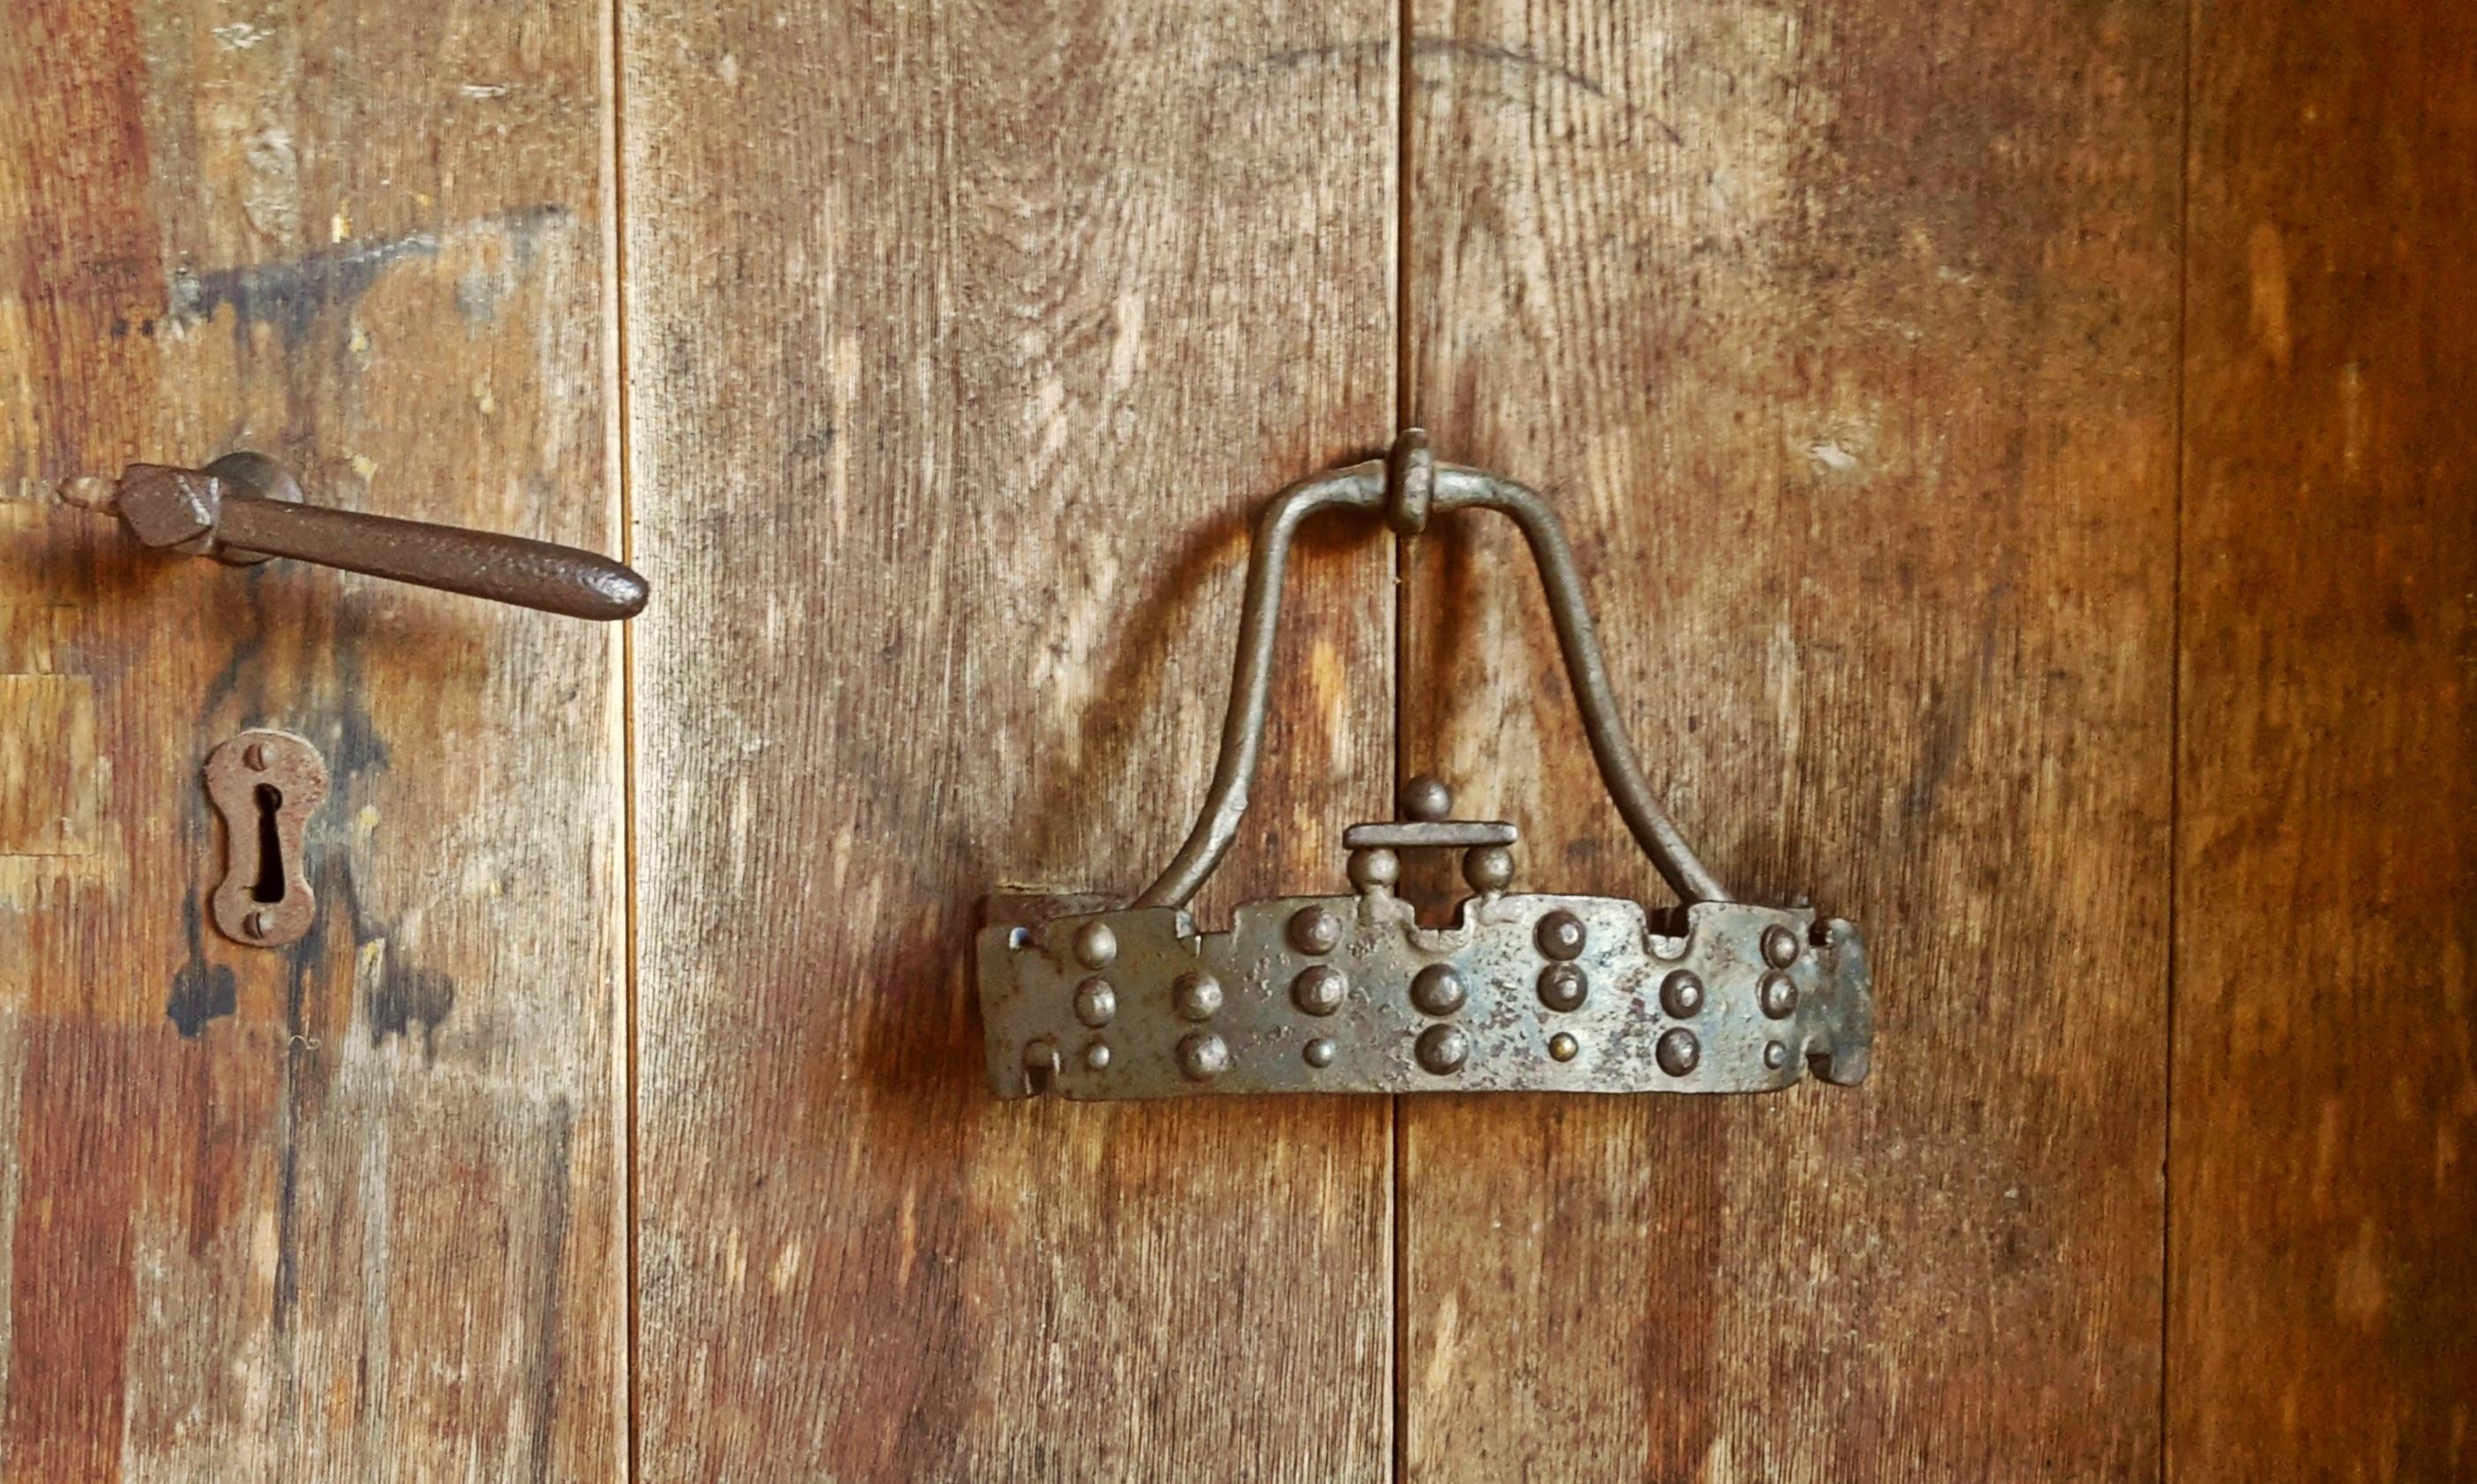 kostenlose foto holz antiquit t korn stock mauer schloss ruine m bel beleuchtung. Black Bedroom Furniture Sets. Home Design Ideas